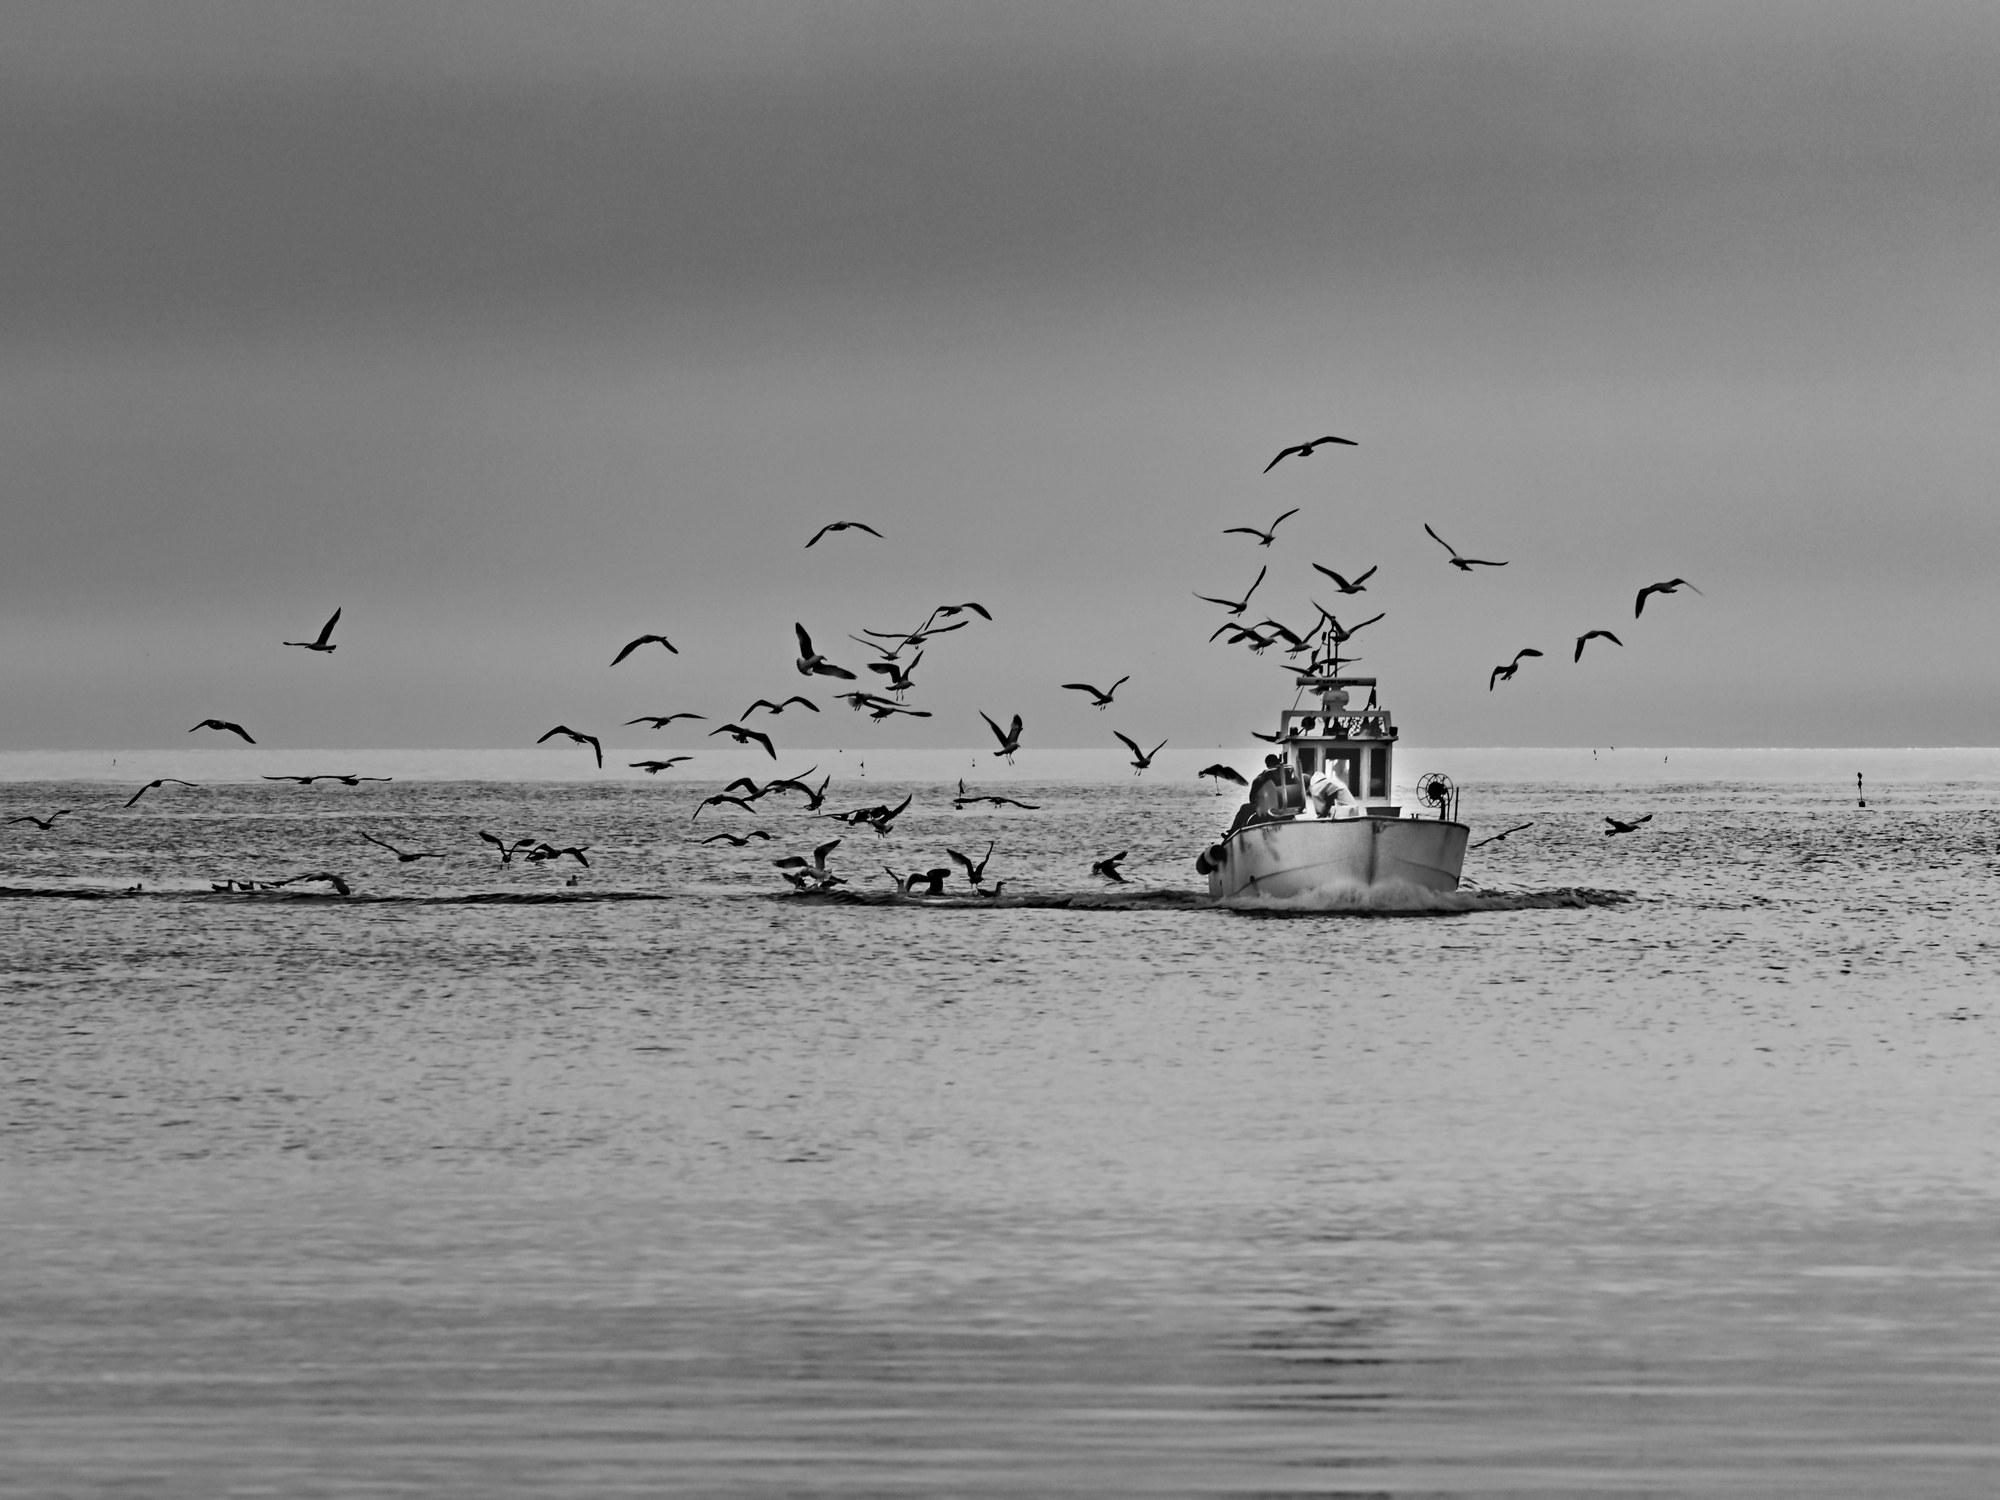 Return from fishing...